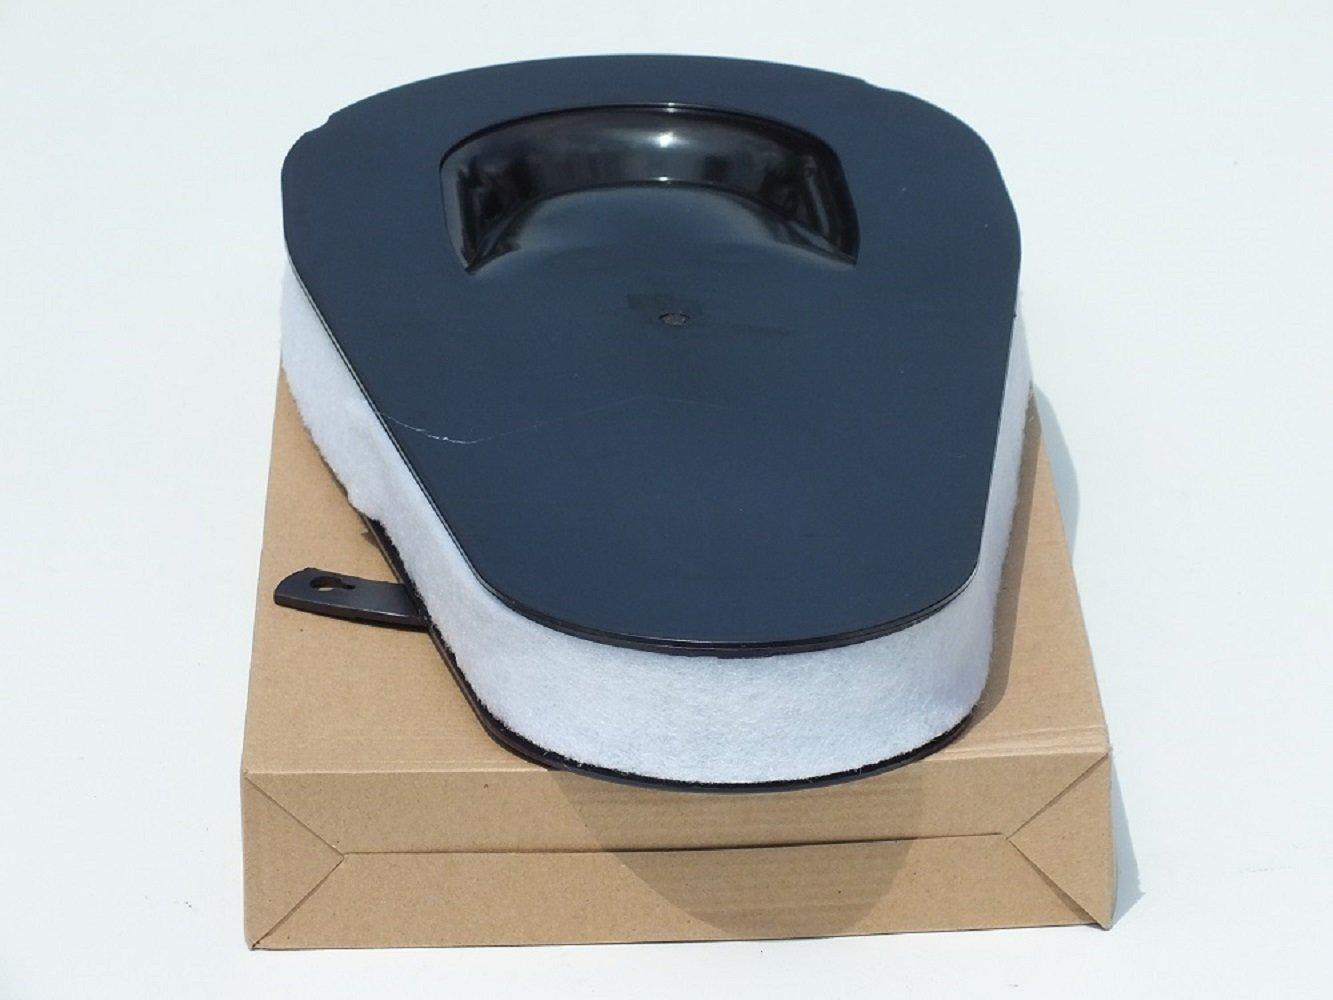 luftfilter bmw 5er f10t f07 f11 7er f01 f02 f03 f04 sct. Black Bedroom Furniture Sets. Home Design Ideas